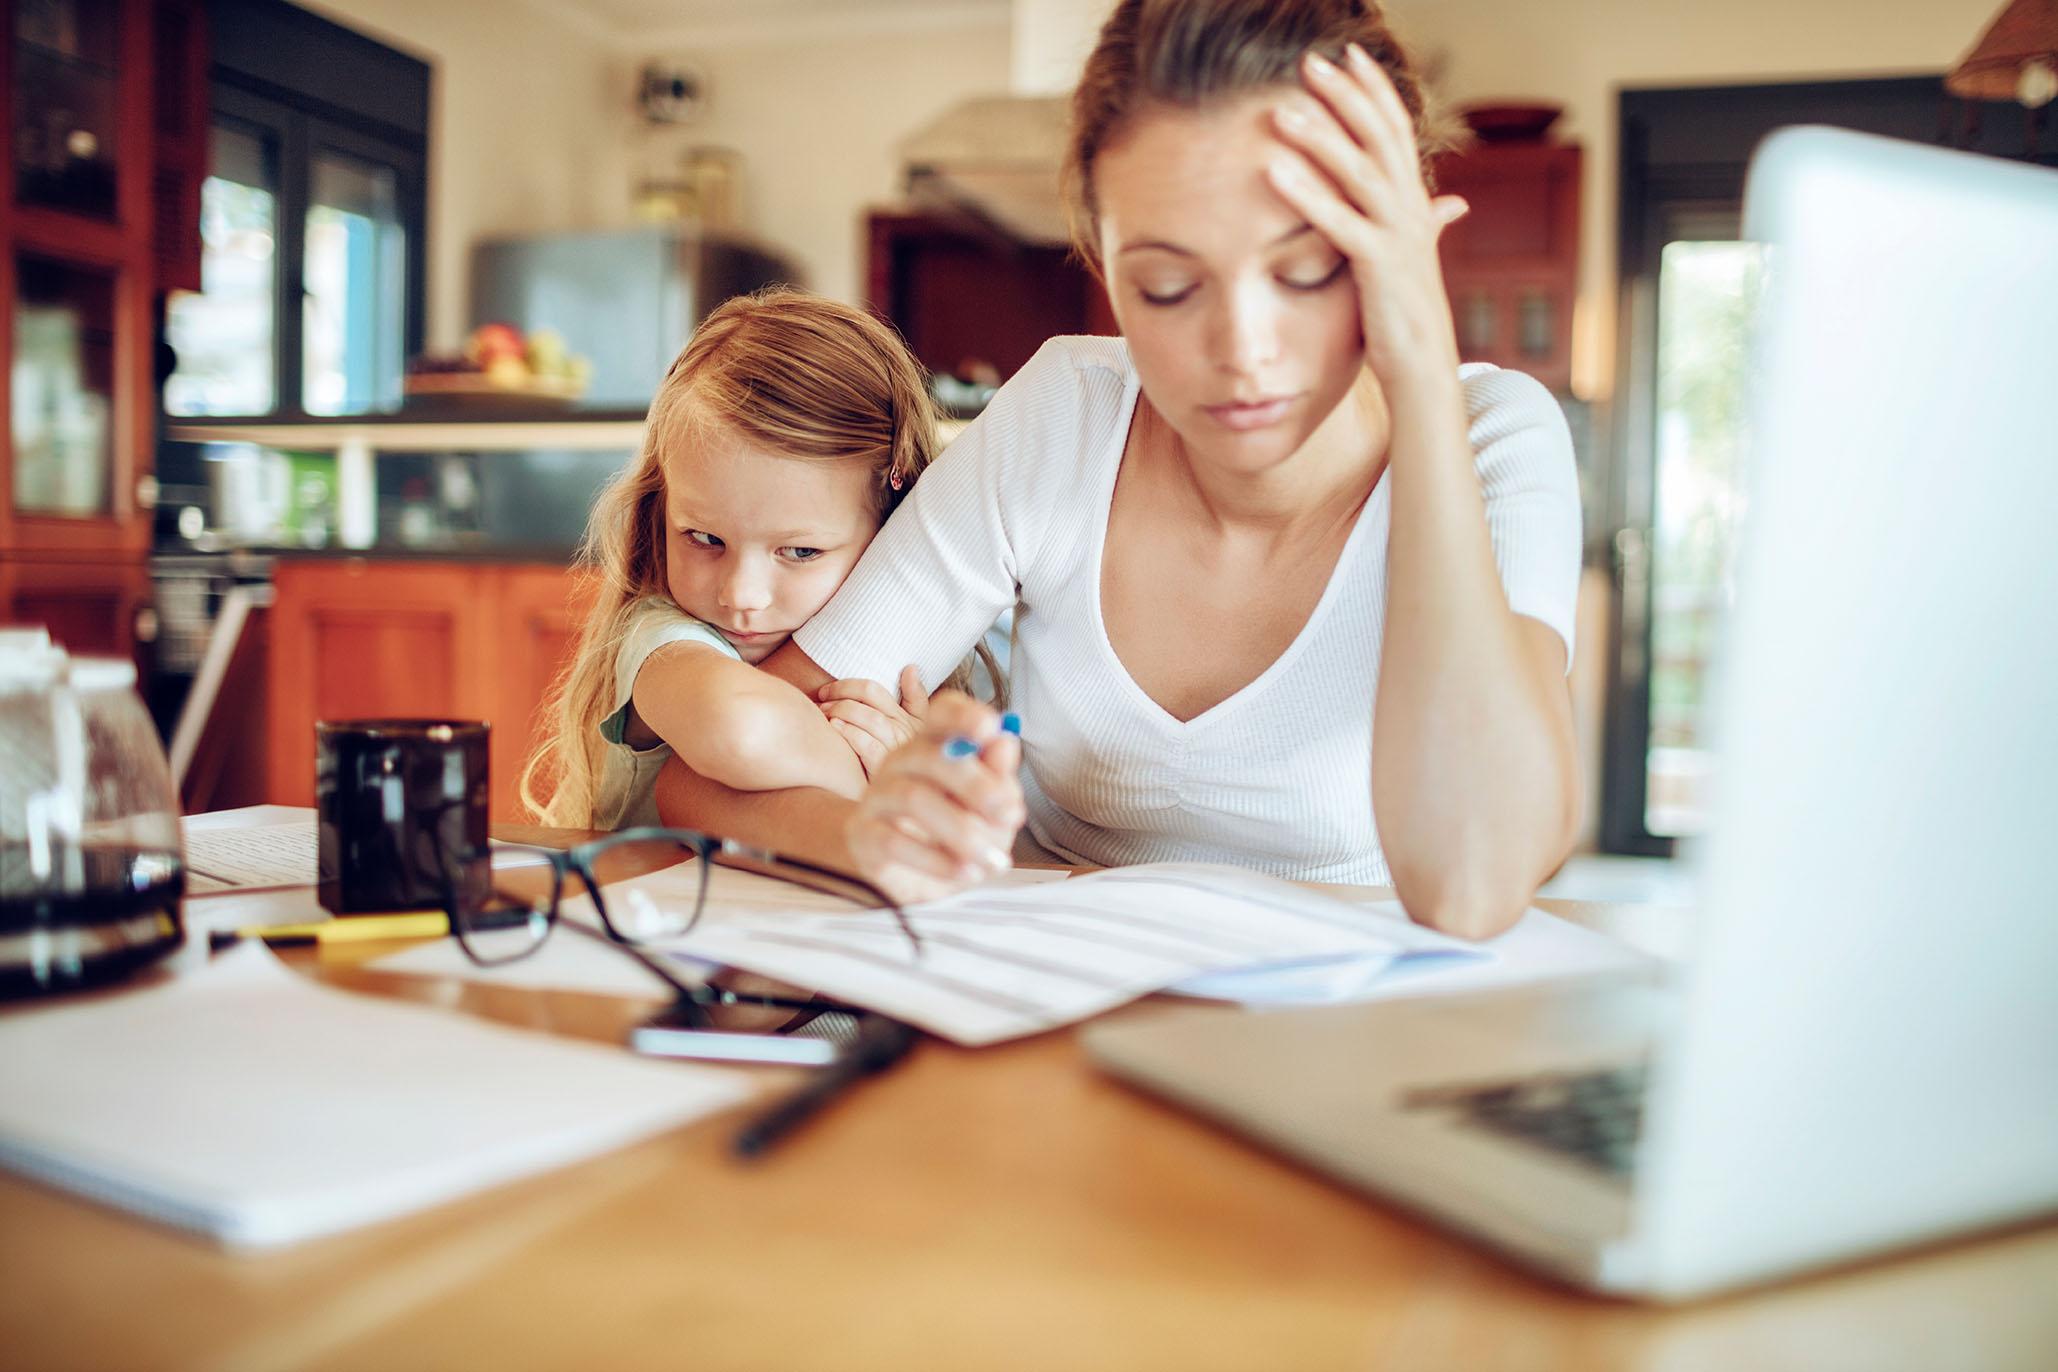 Improve paid parental leave provisions -